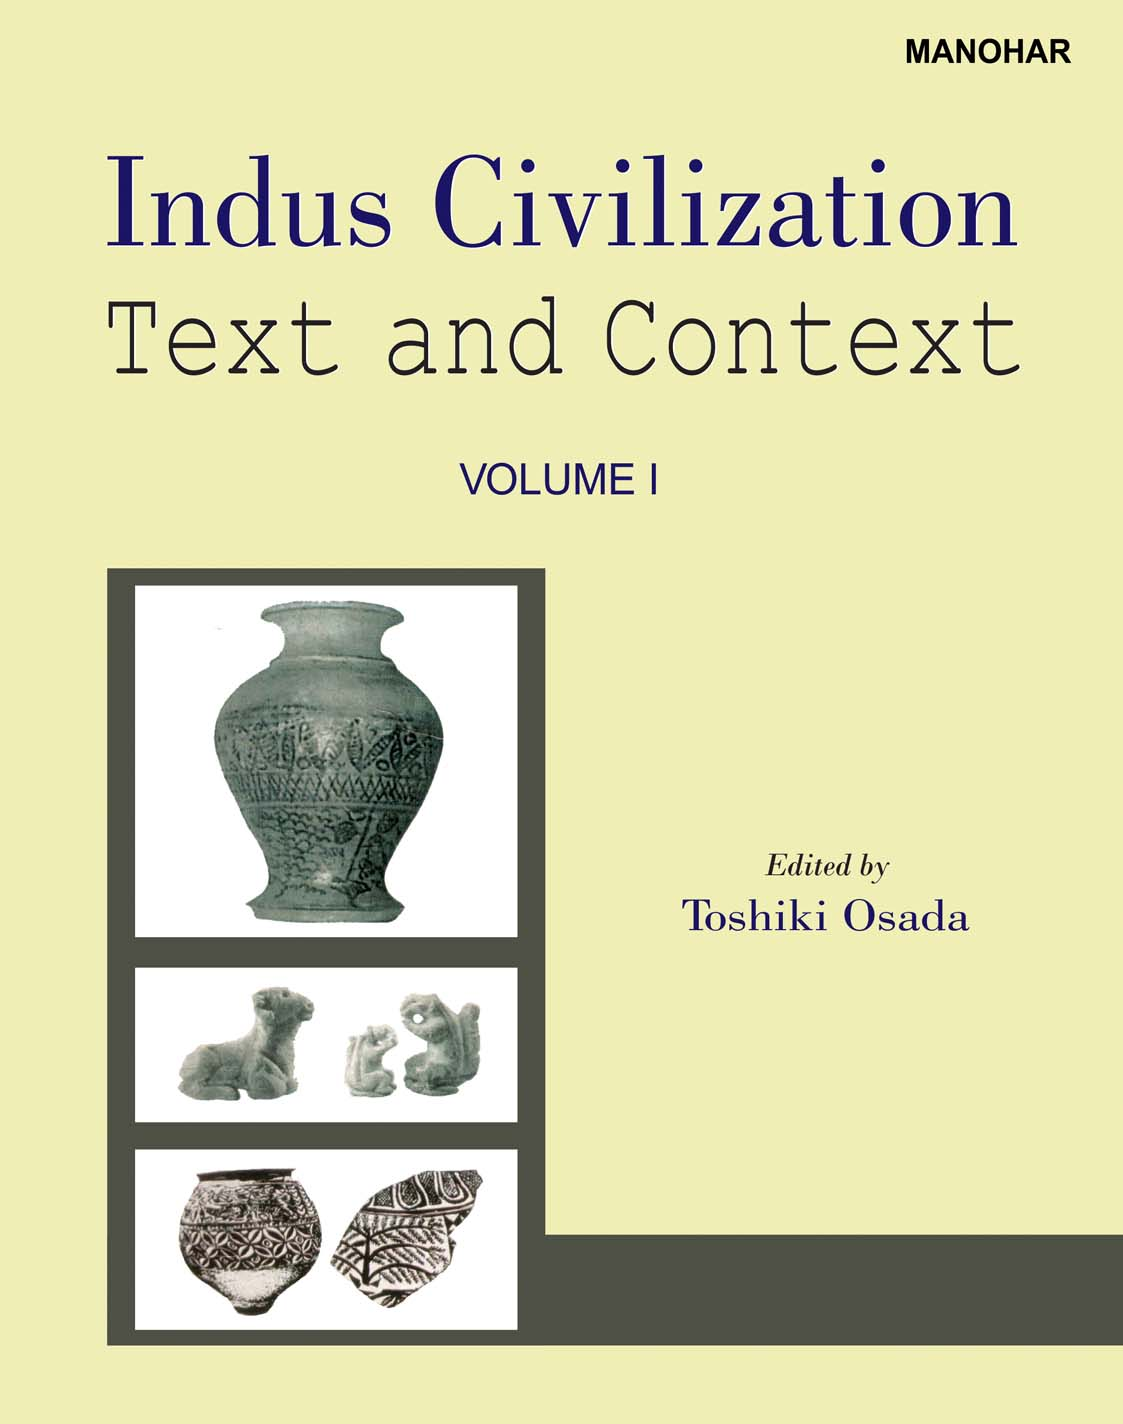 INDUS CIVILIZATION: TEXT AND CONTEXT: VOLUME 1